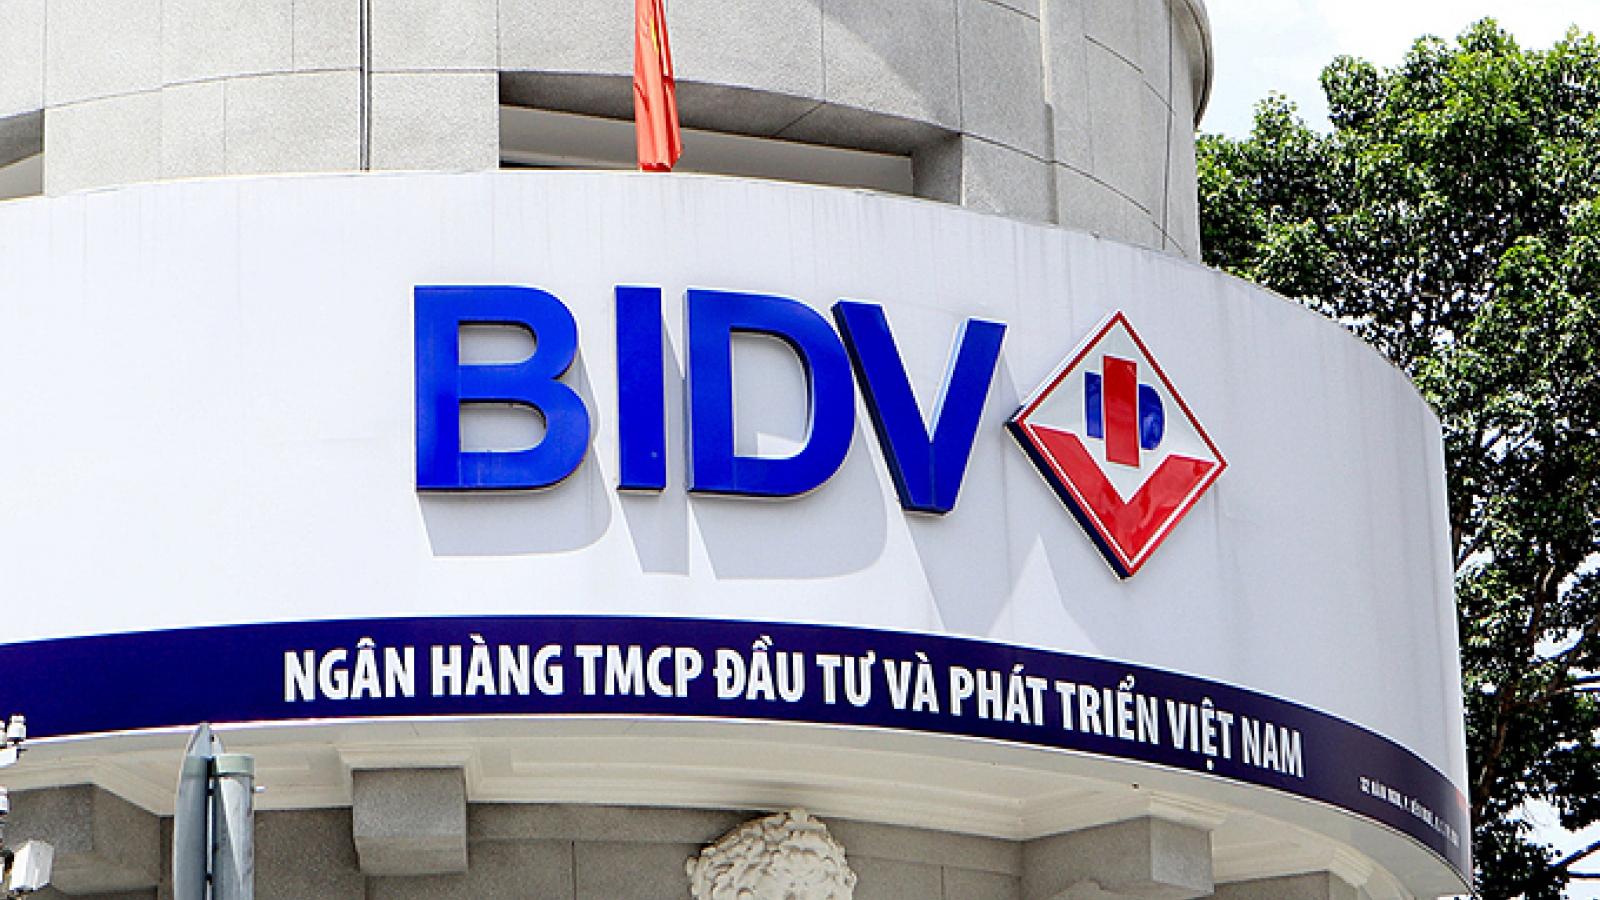 BIDV named Best SME Bank South East Asia 2021 by Global Finance